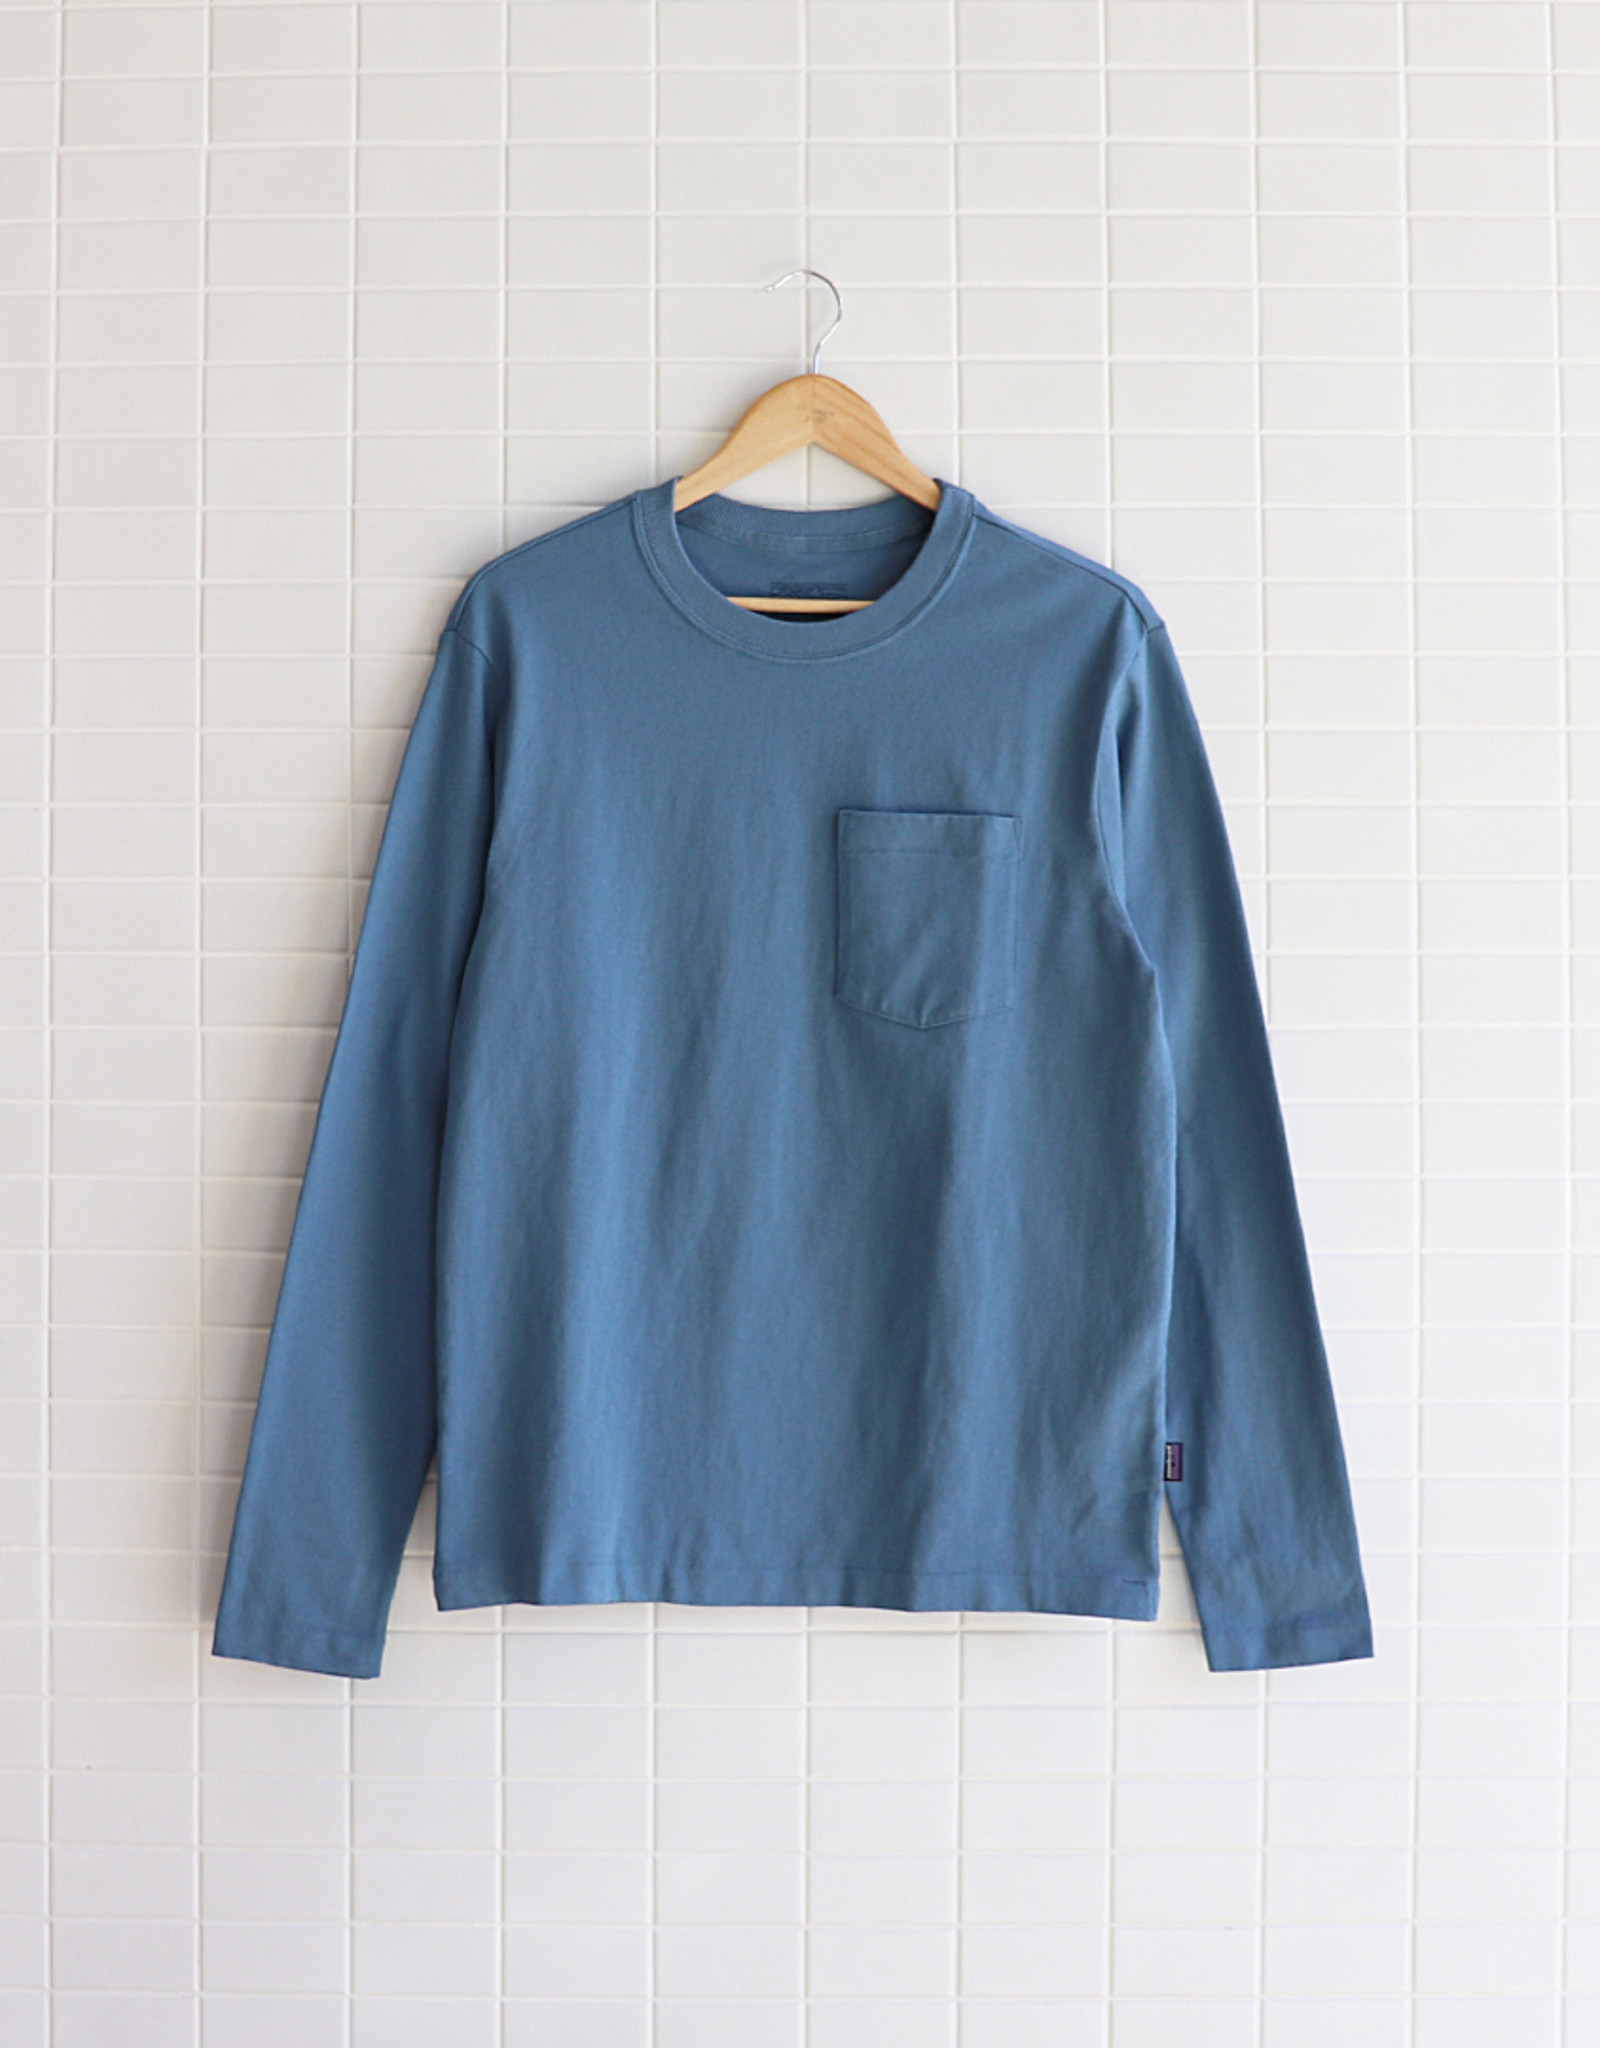 Patagonia - L/S Organic Cotton Pocket Tee - Pigeon Blue